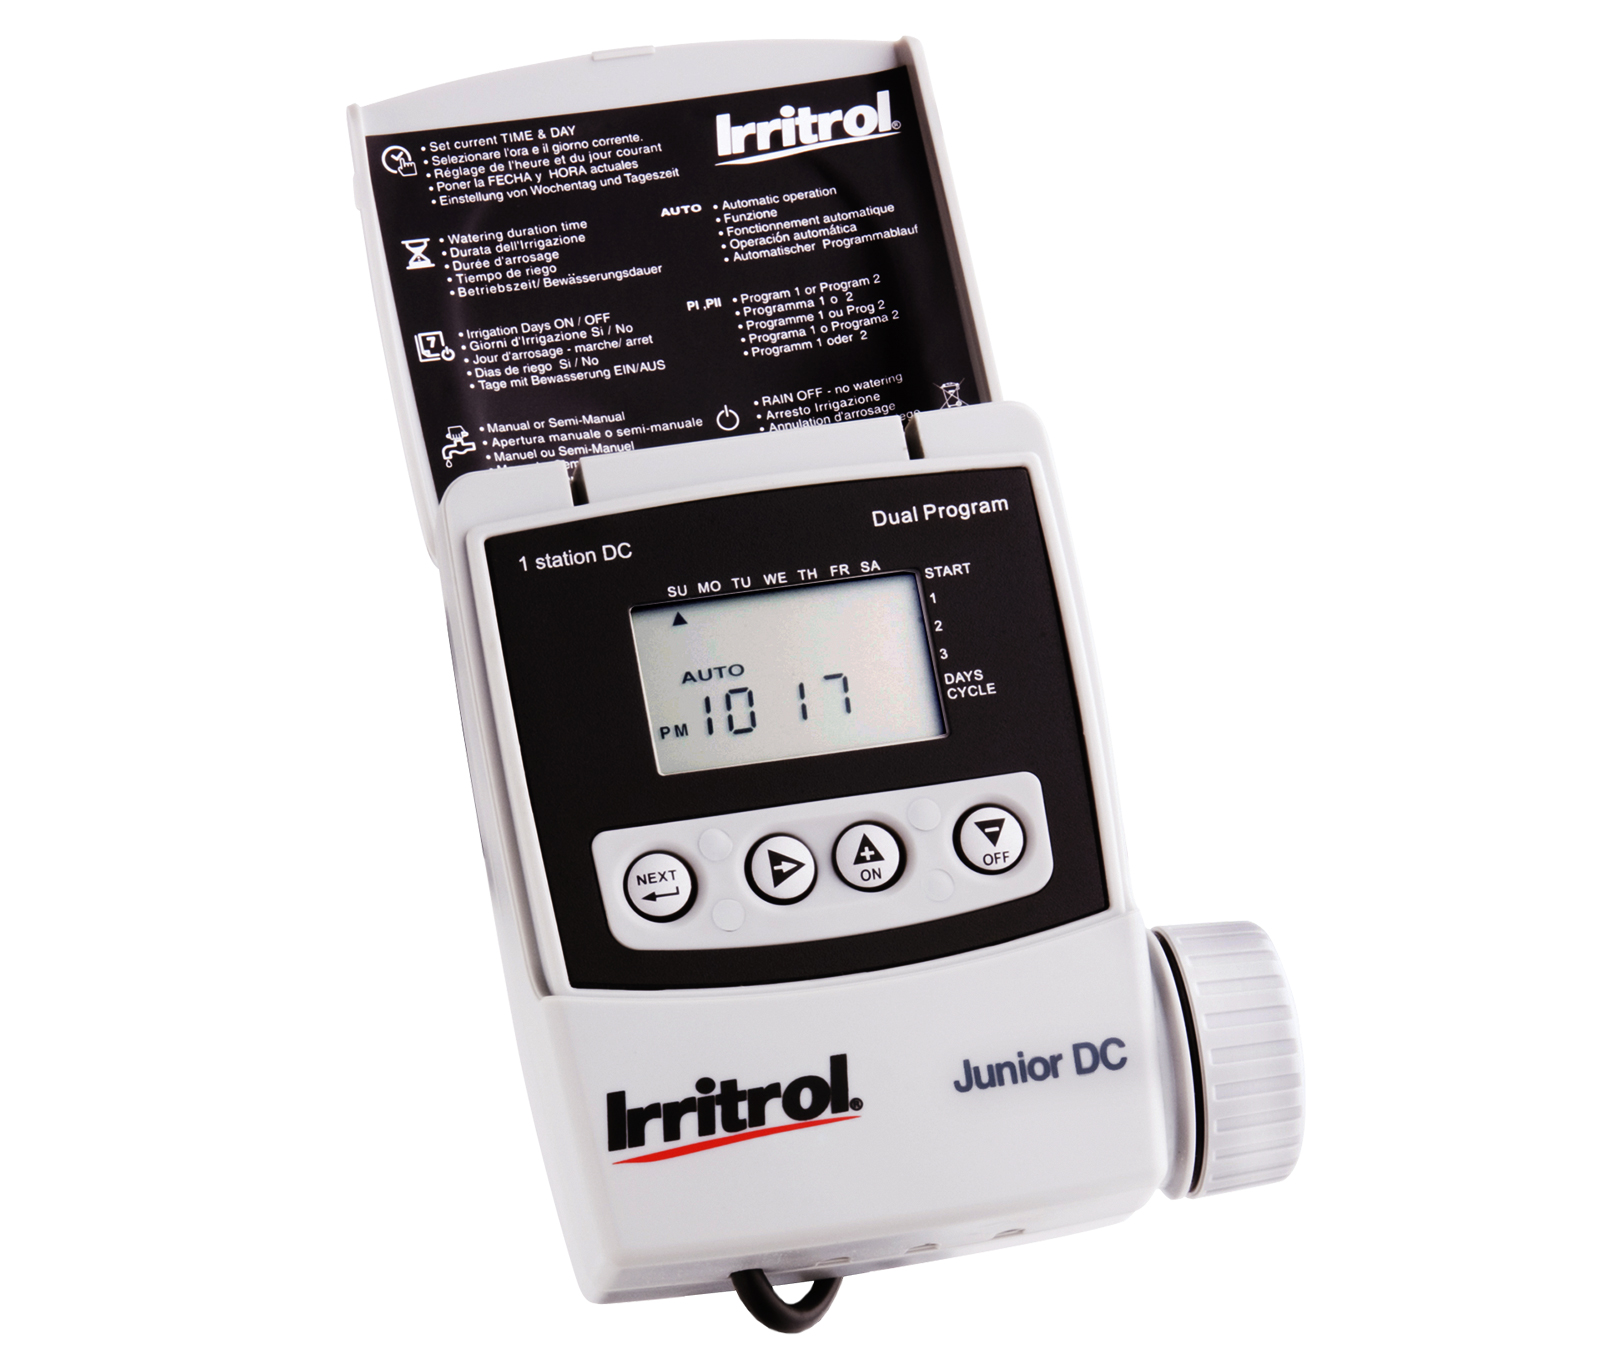 junior_dc_studio.ashx?mw=700&mh=599&hash=4FF403A9149FD0C6330934FF740AC0C8470977E2 irritrol junior dc series irritrol rd-900 wiring diagram at creativeand.co